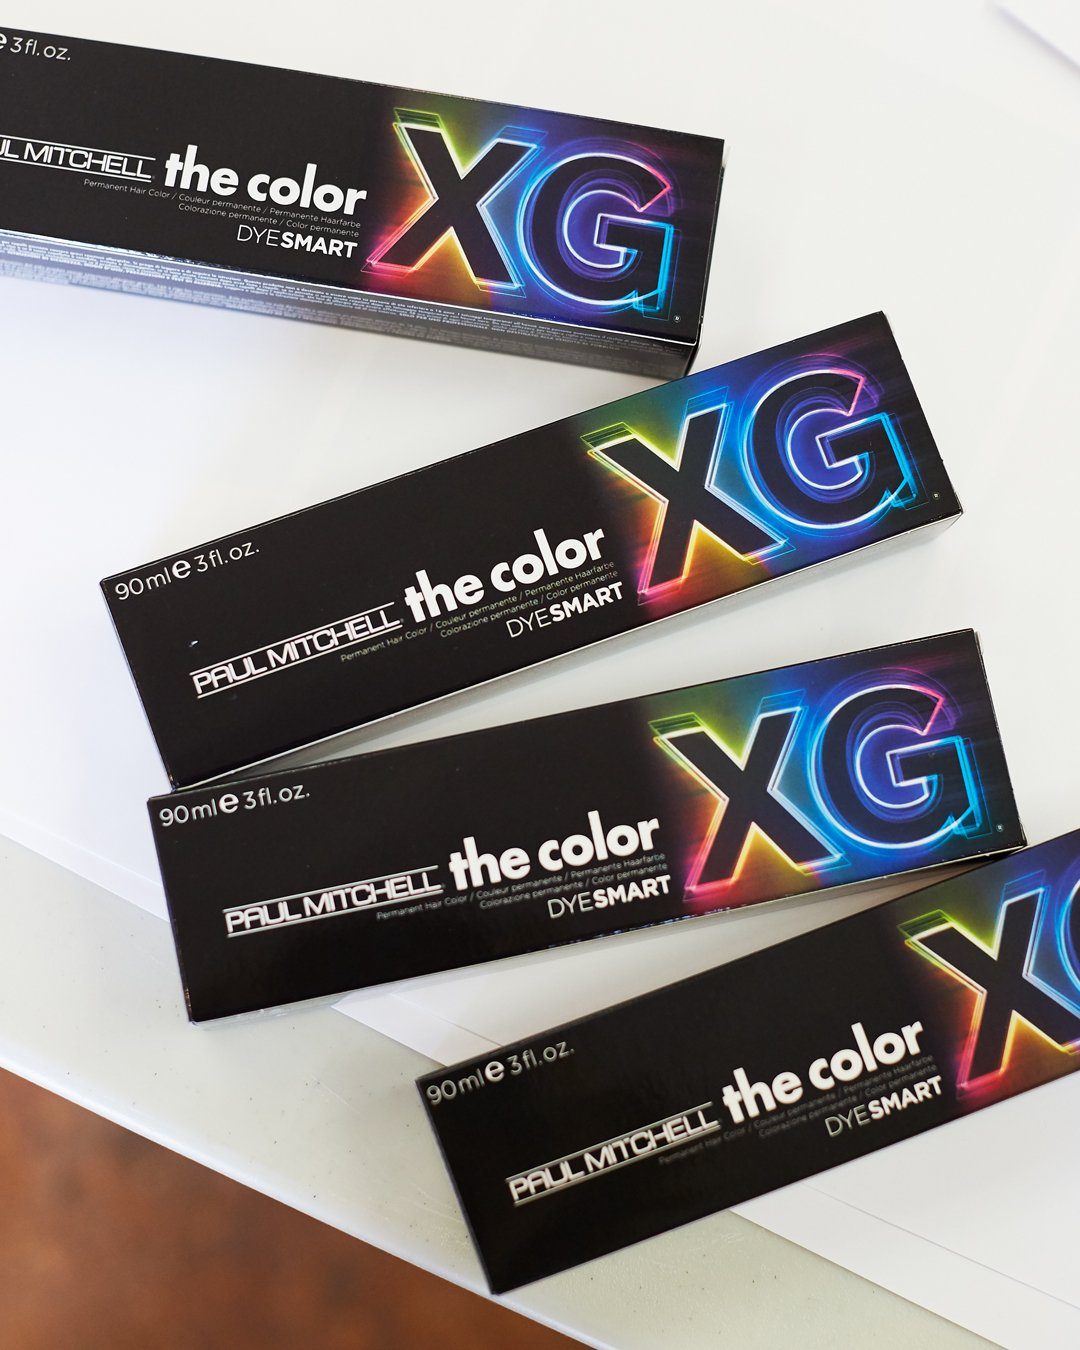 Paul Mitchell the Color XG: The Vegan Alternative